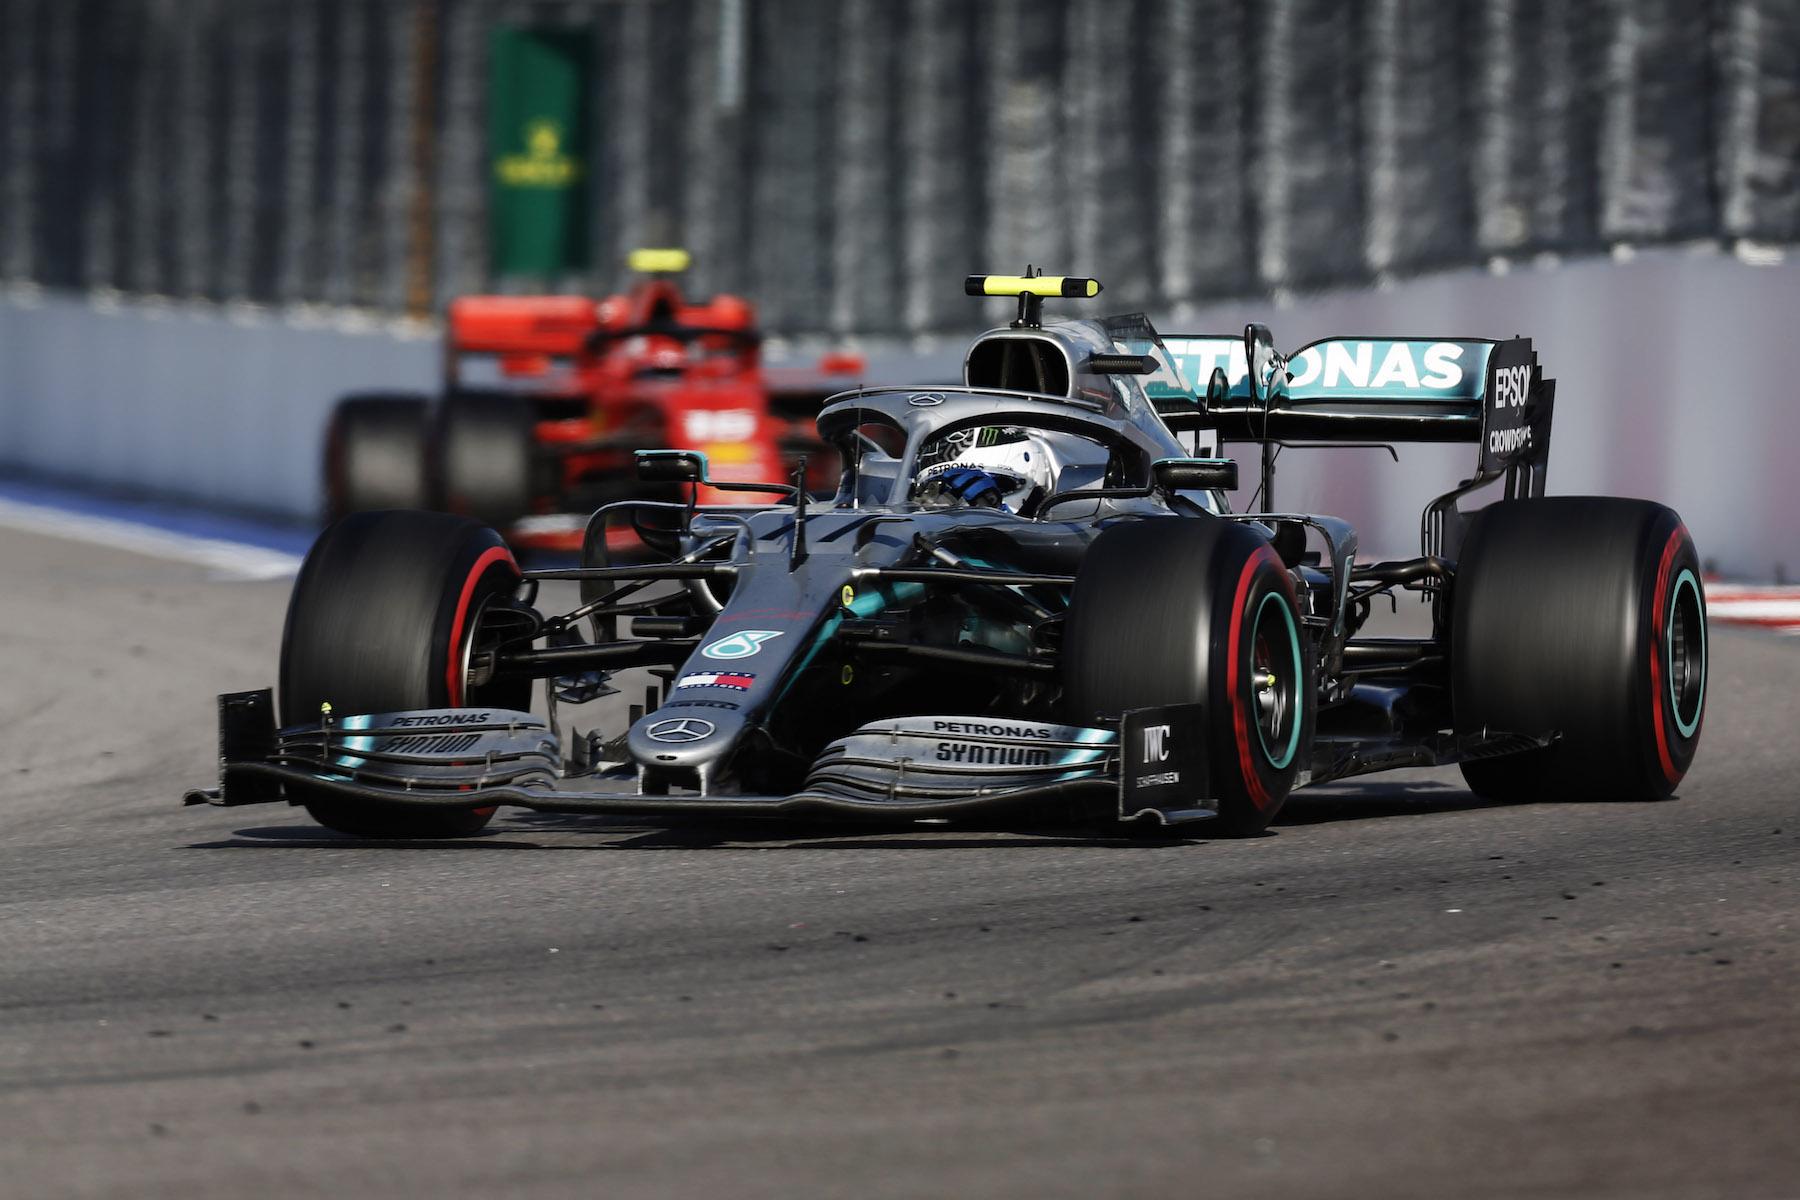 4 2019 Russian GP Sunday 20.jpg